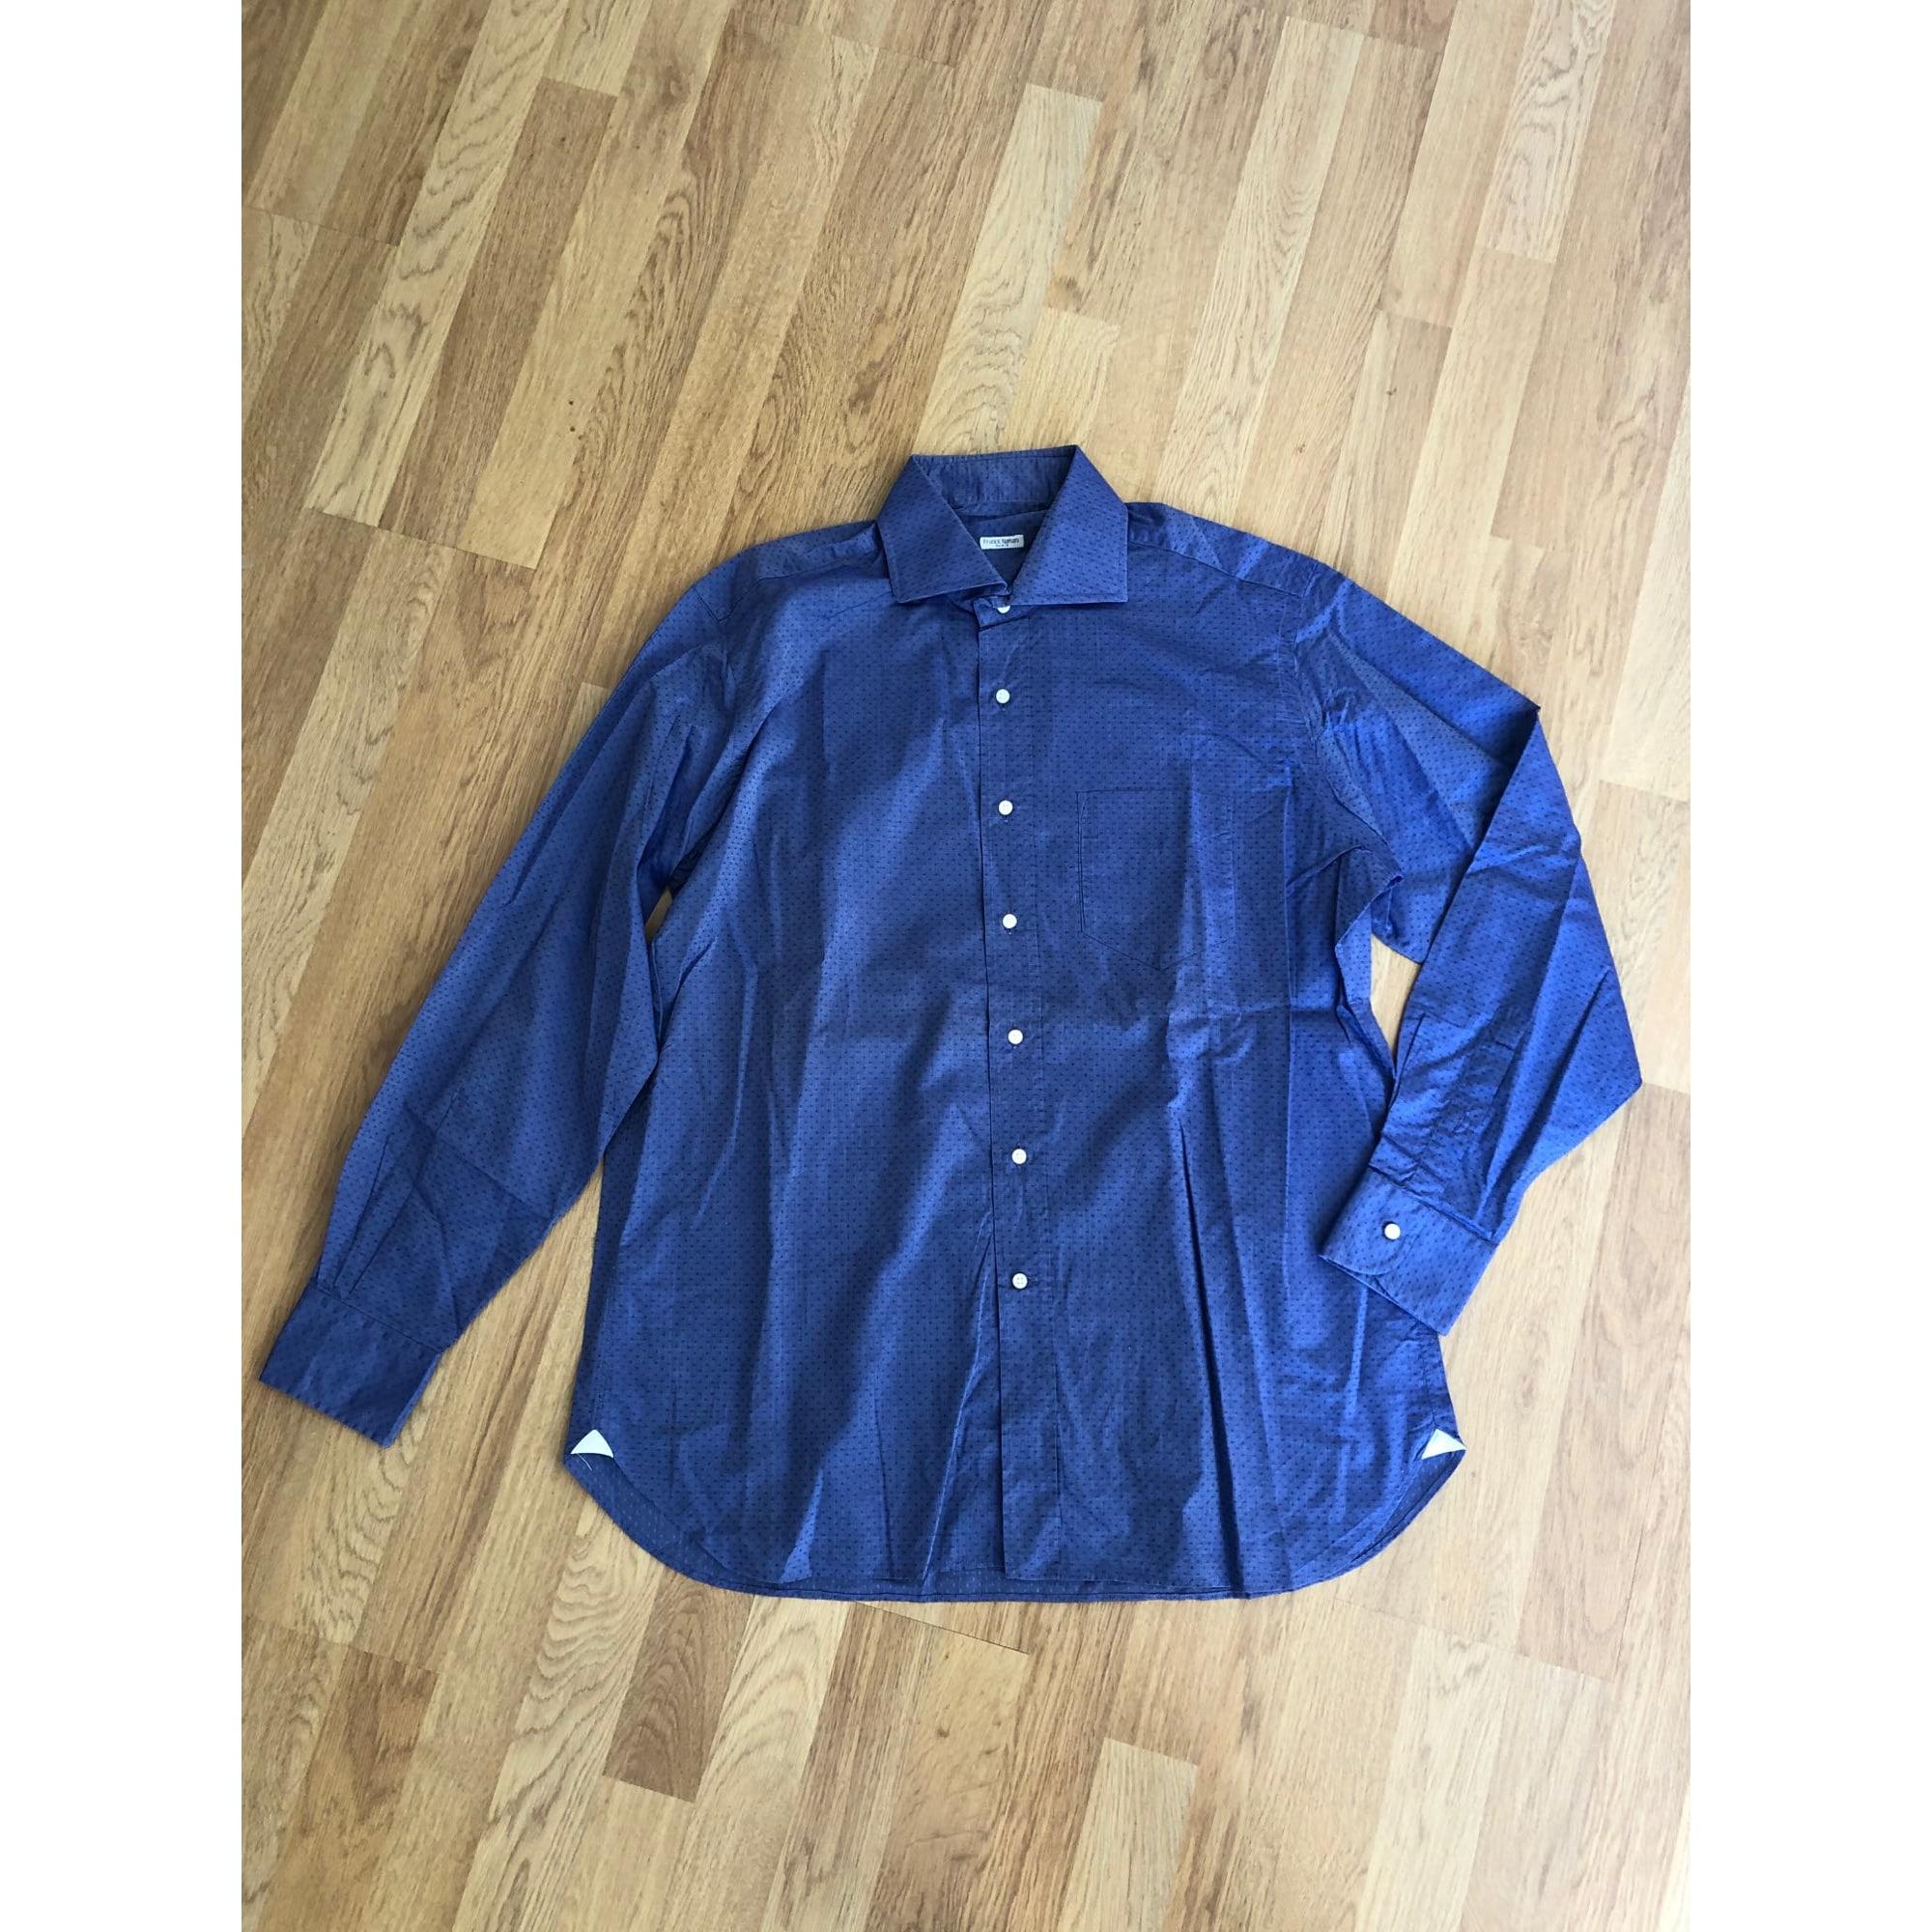 Chemise FRANCK NAMANI Bleu, bleu marine, bleu turquoise